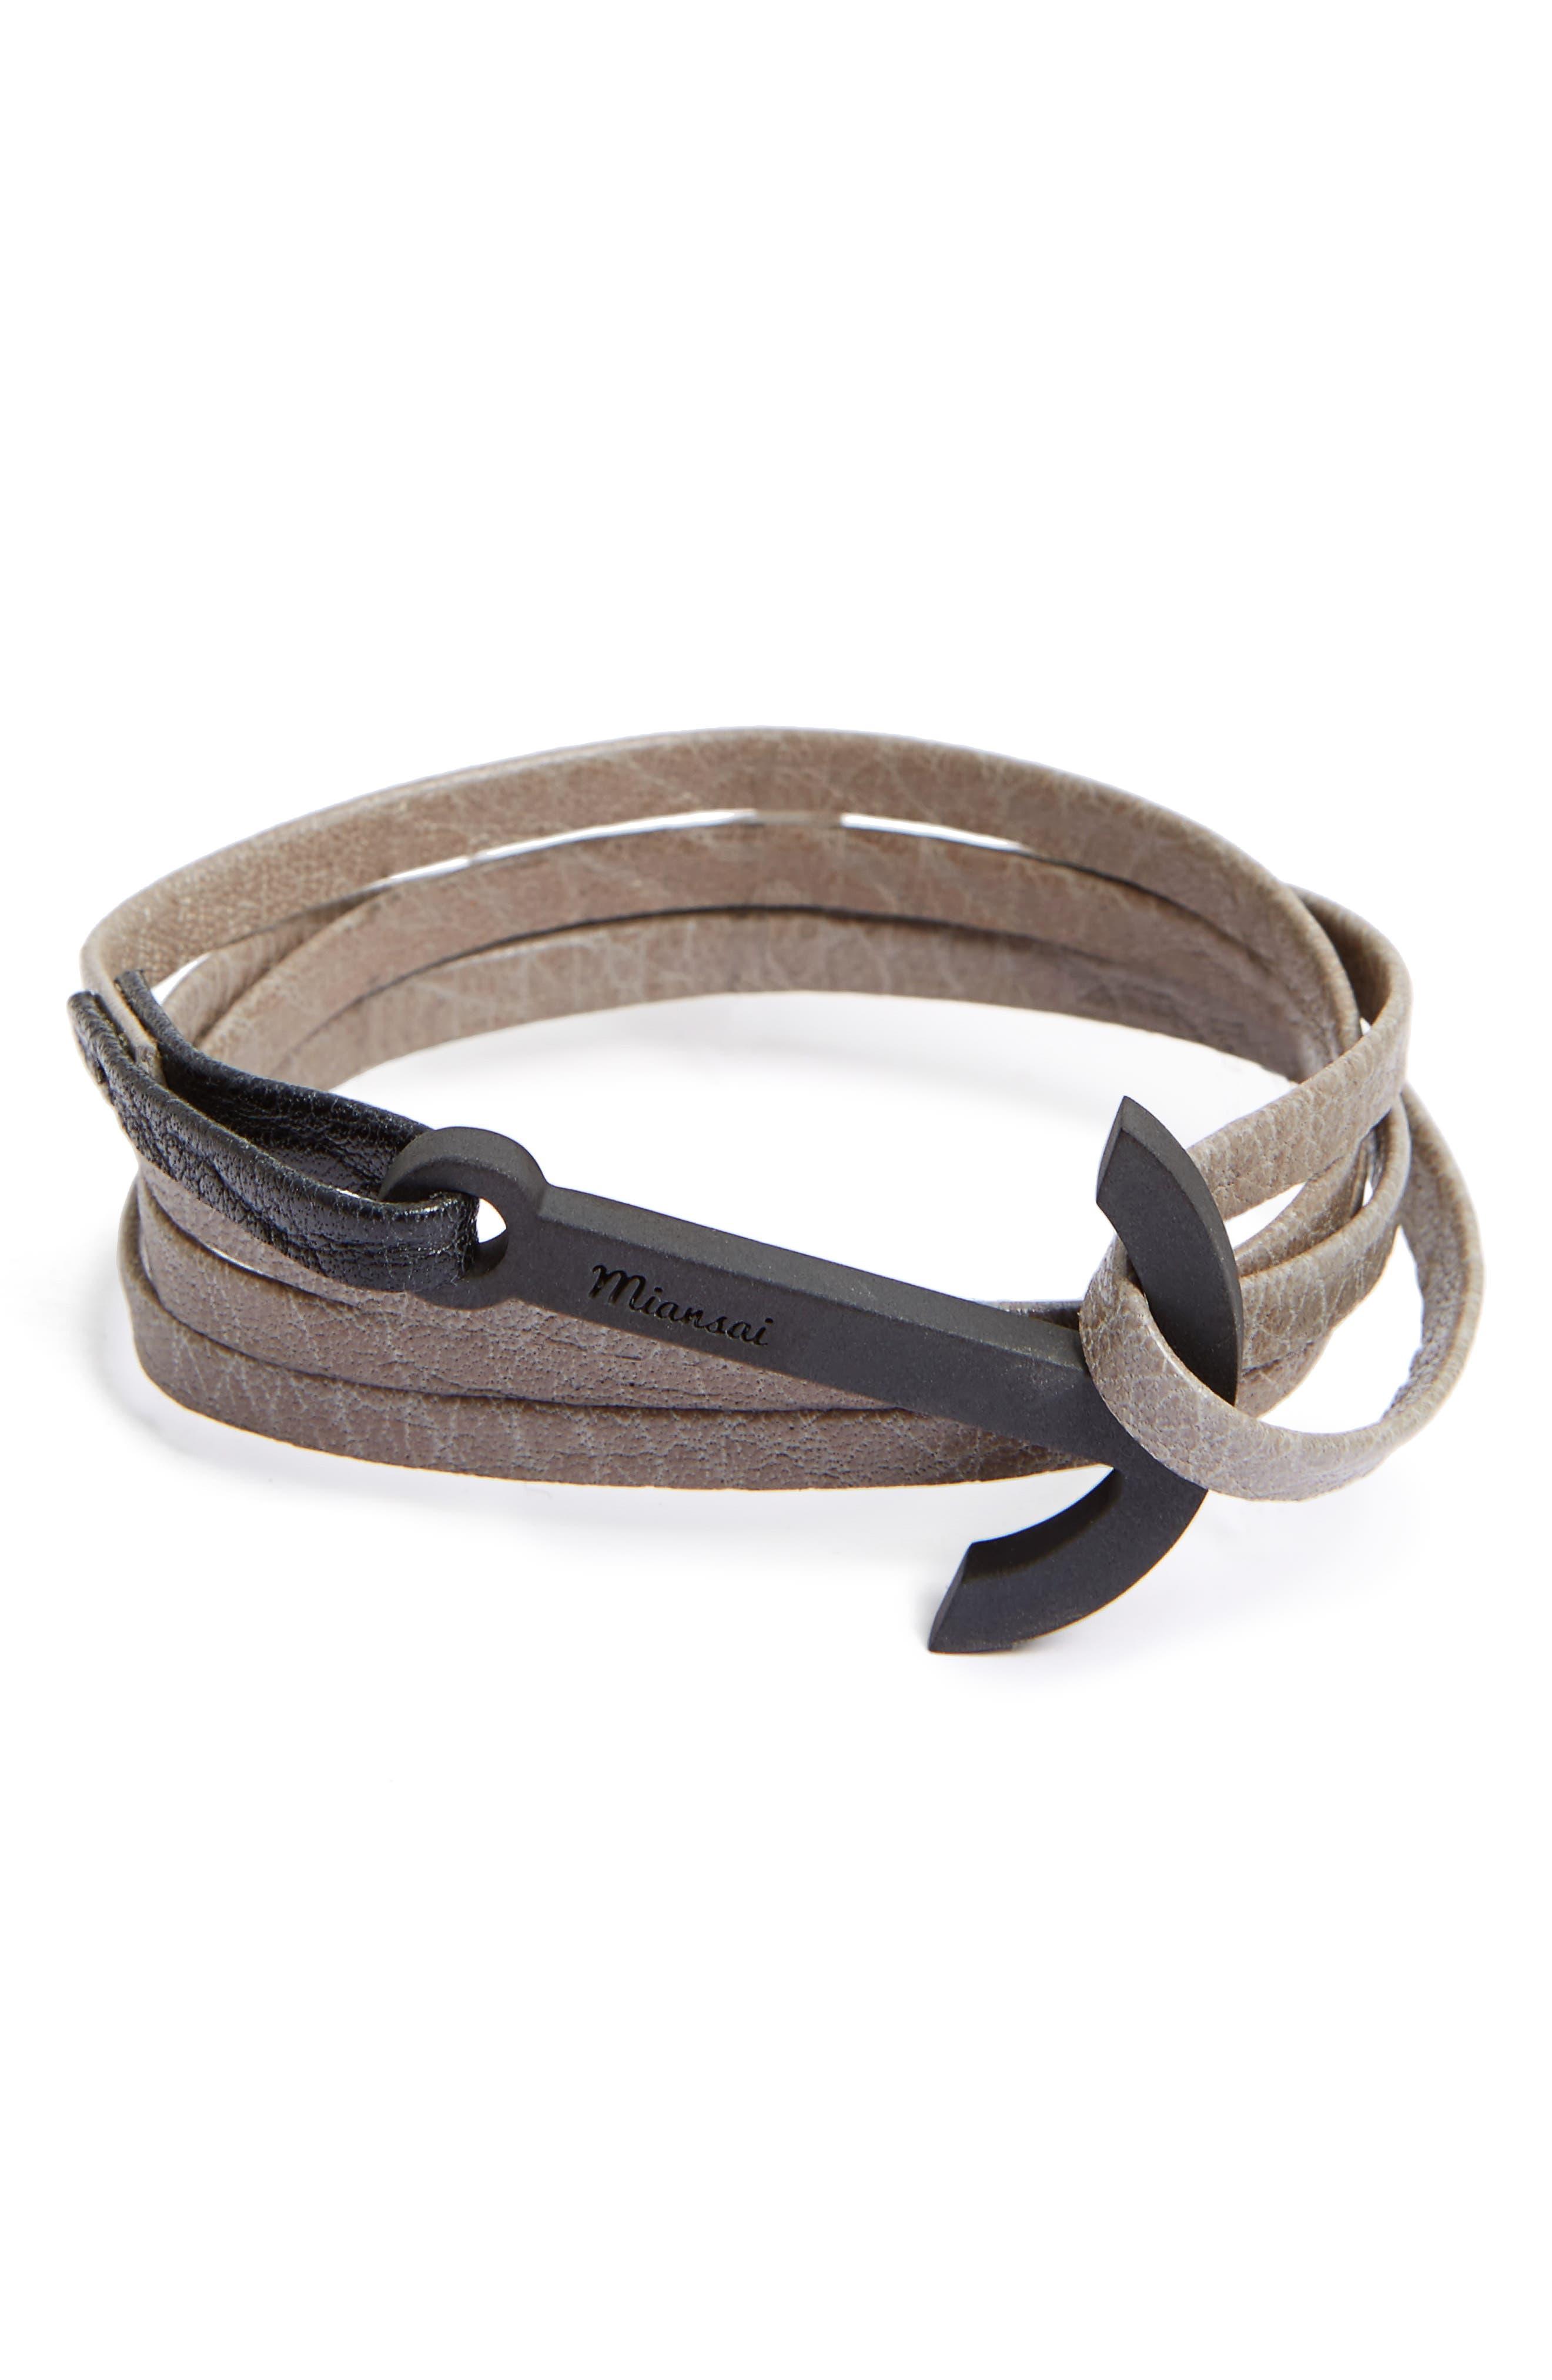 Modern Anchor Leather Wrap Bracelet,                             Main thumbnail 1, color,                             060